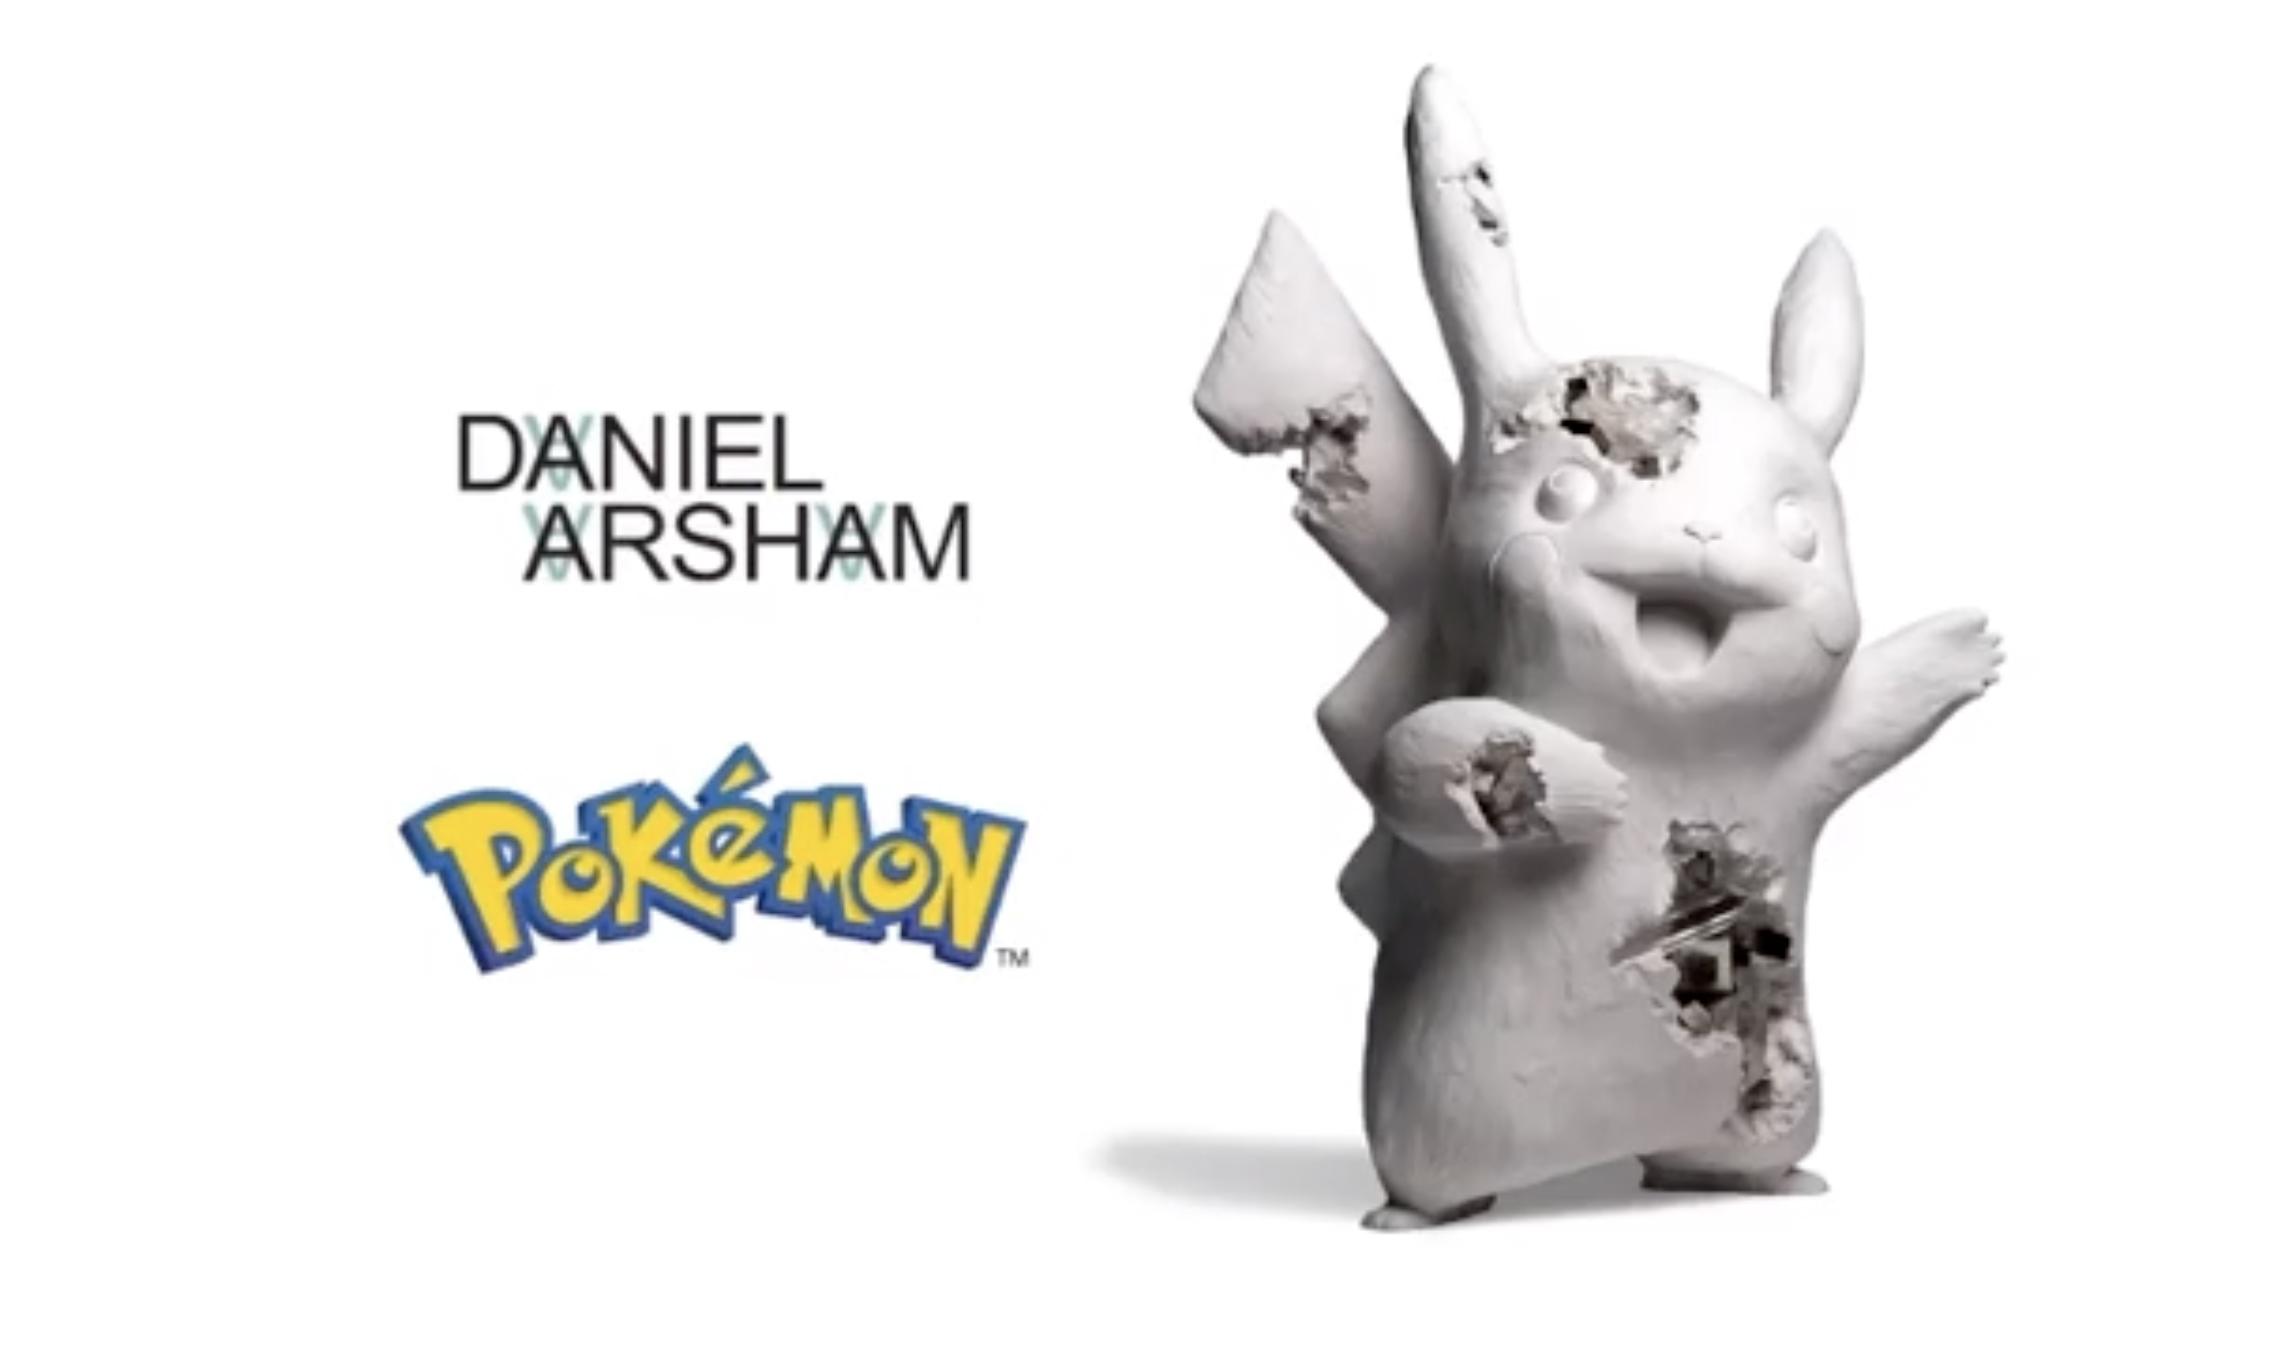 Daniel Arsham x Pokémon x UNIQLO UT 三方联名预告释出